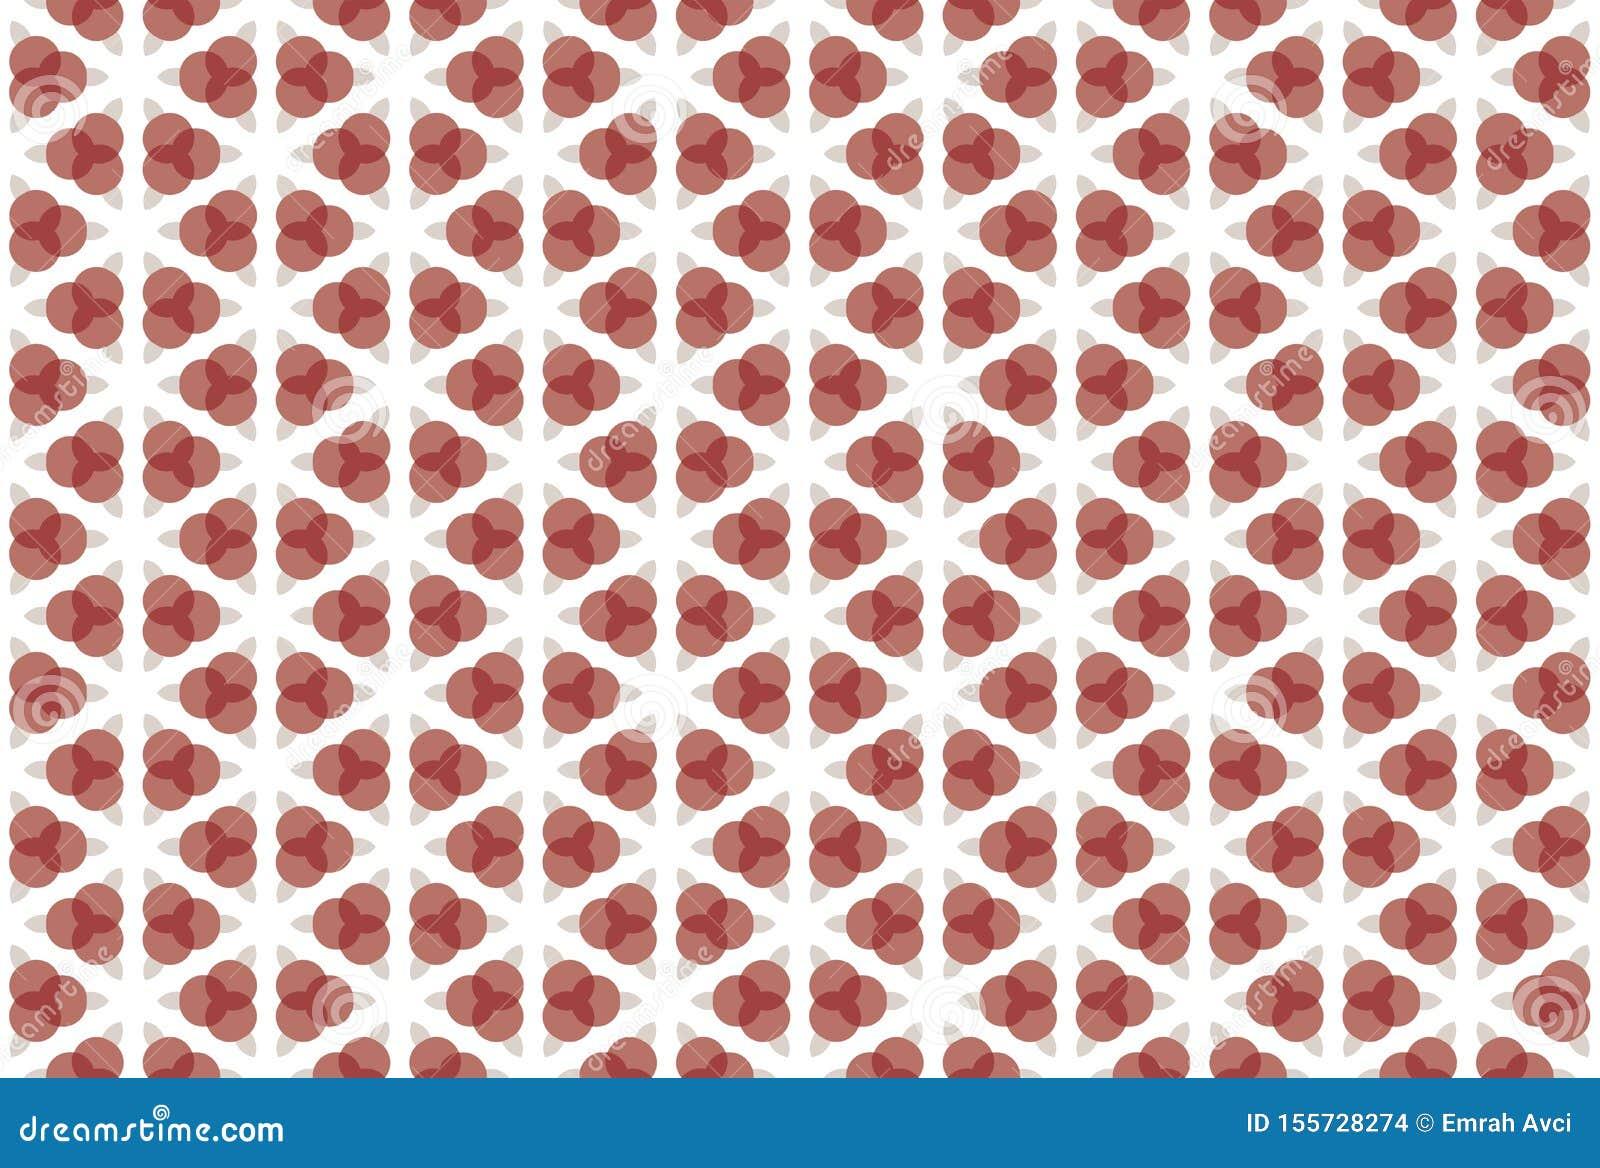 Naadloos patroon Witte achtergrond, geometrisch, gestalte gegeven drie overlappende cirkels, rond gemaakte diamanten in licht en